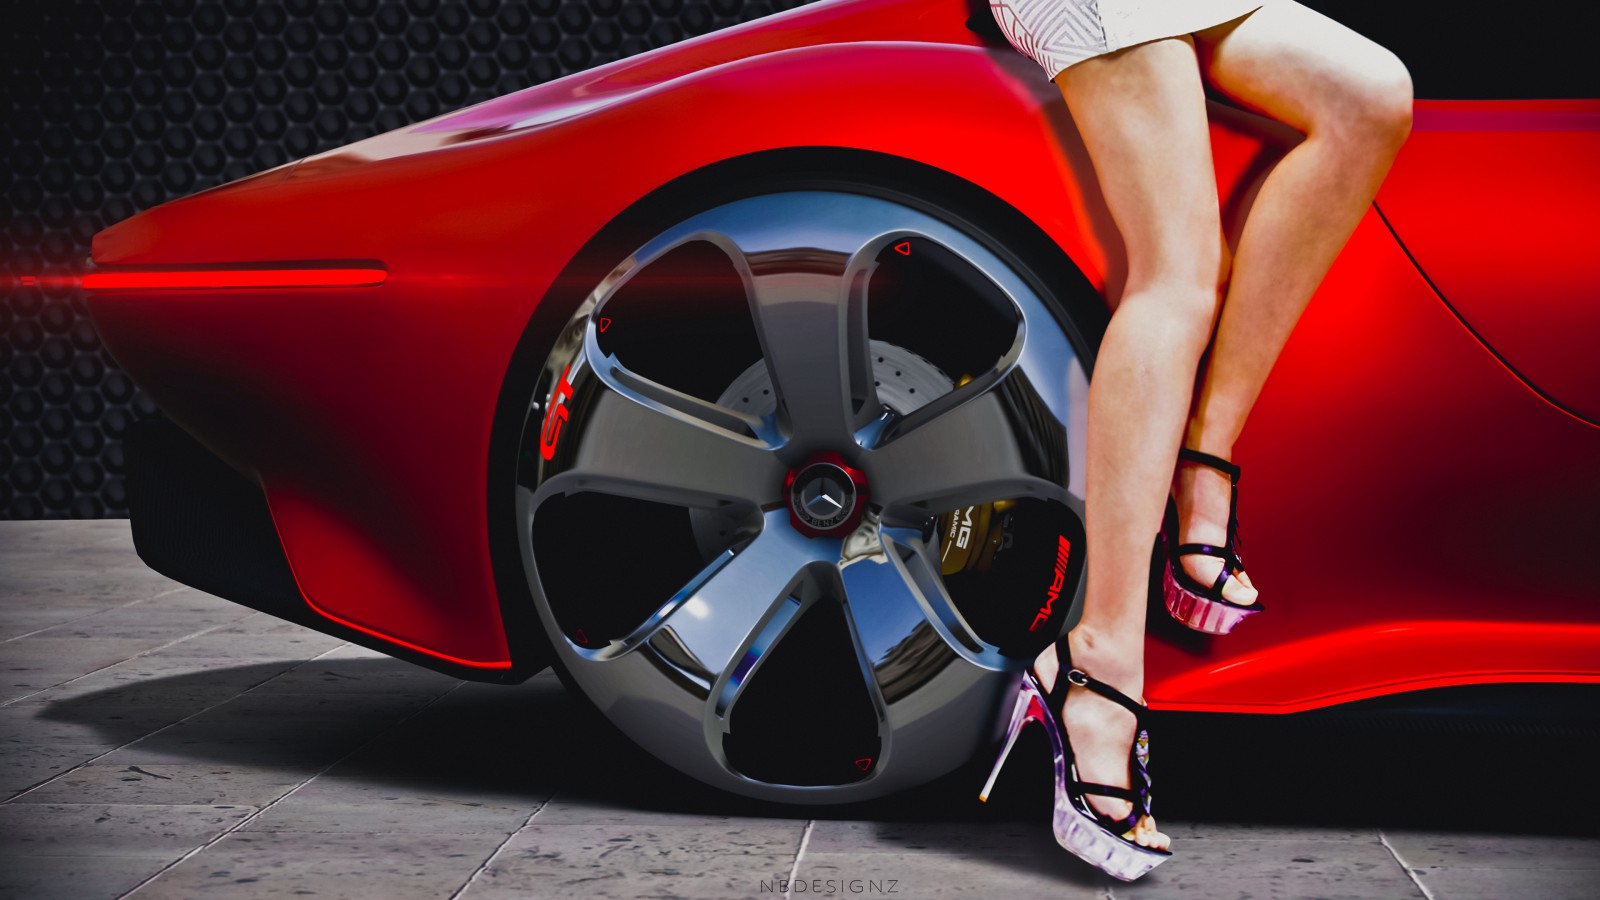 Mercedes Benz AMG Vision GT Gran Turismo 6 Wallpaper | HD ...